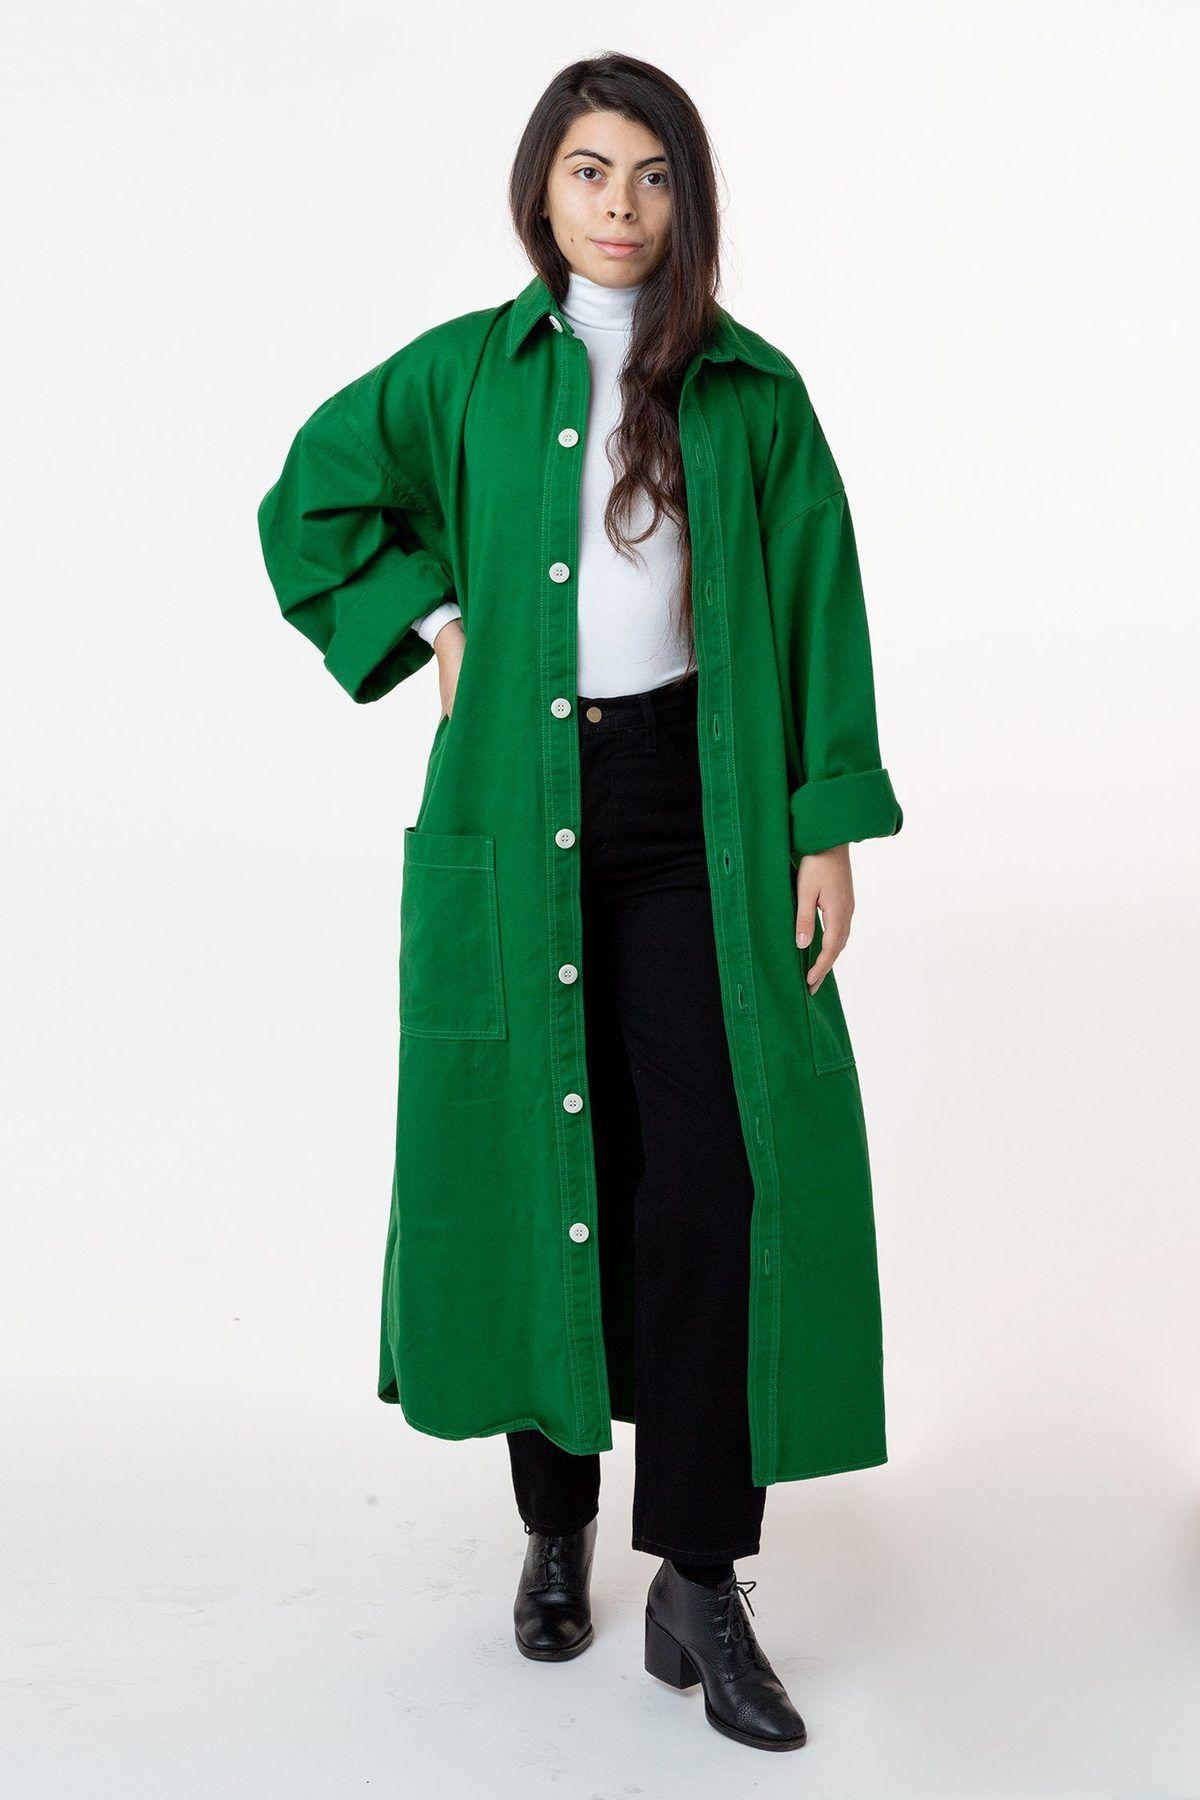 Rct305 The Lab Coat Coat Oversized Shirt Dress Lab Coat